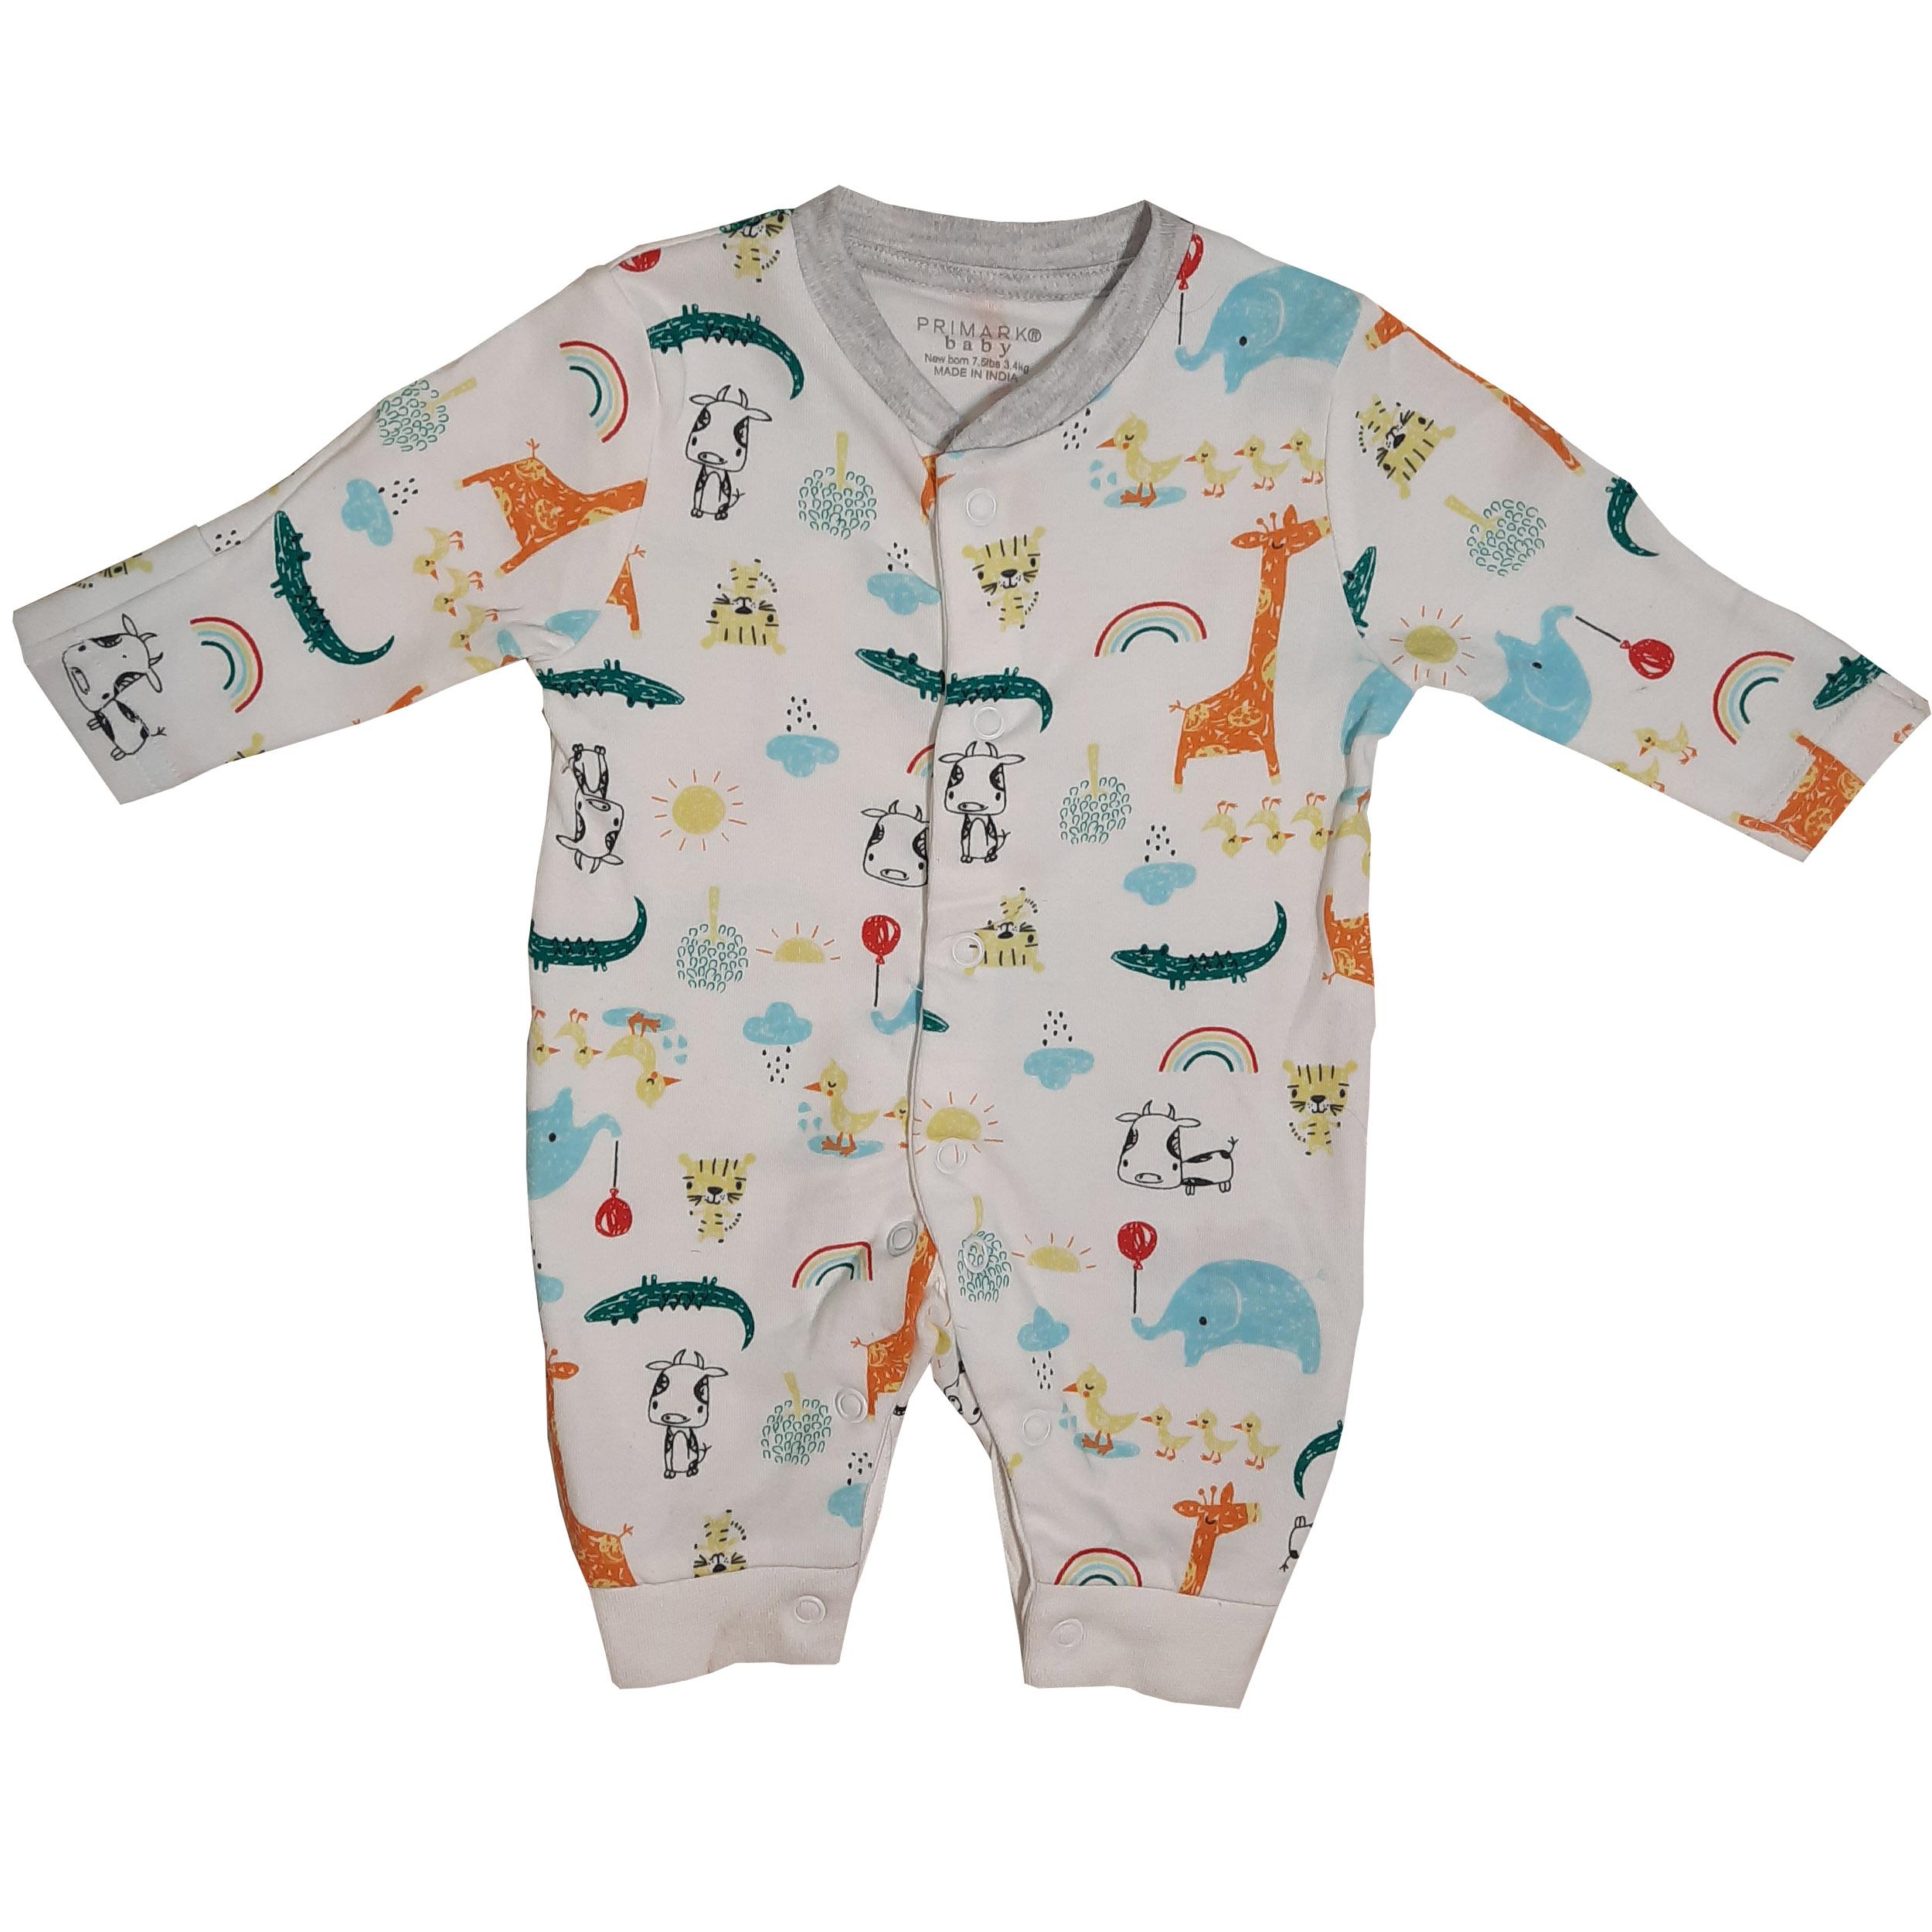 سرهمی نوزادی پیریمارک کد 2055C